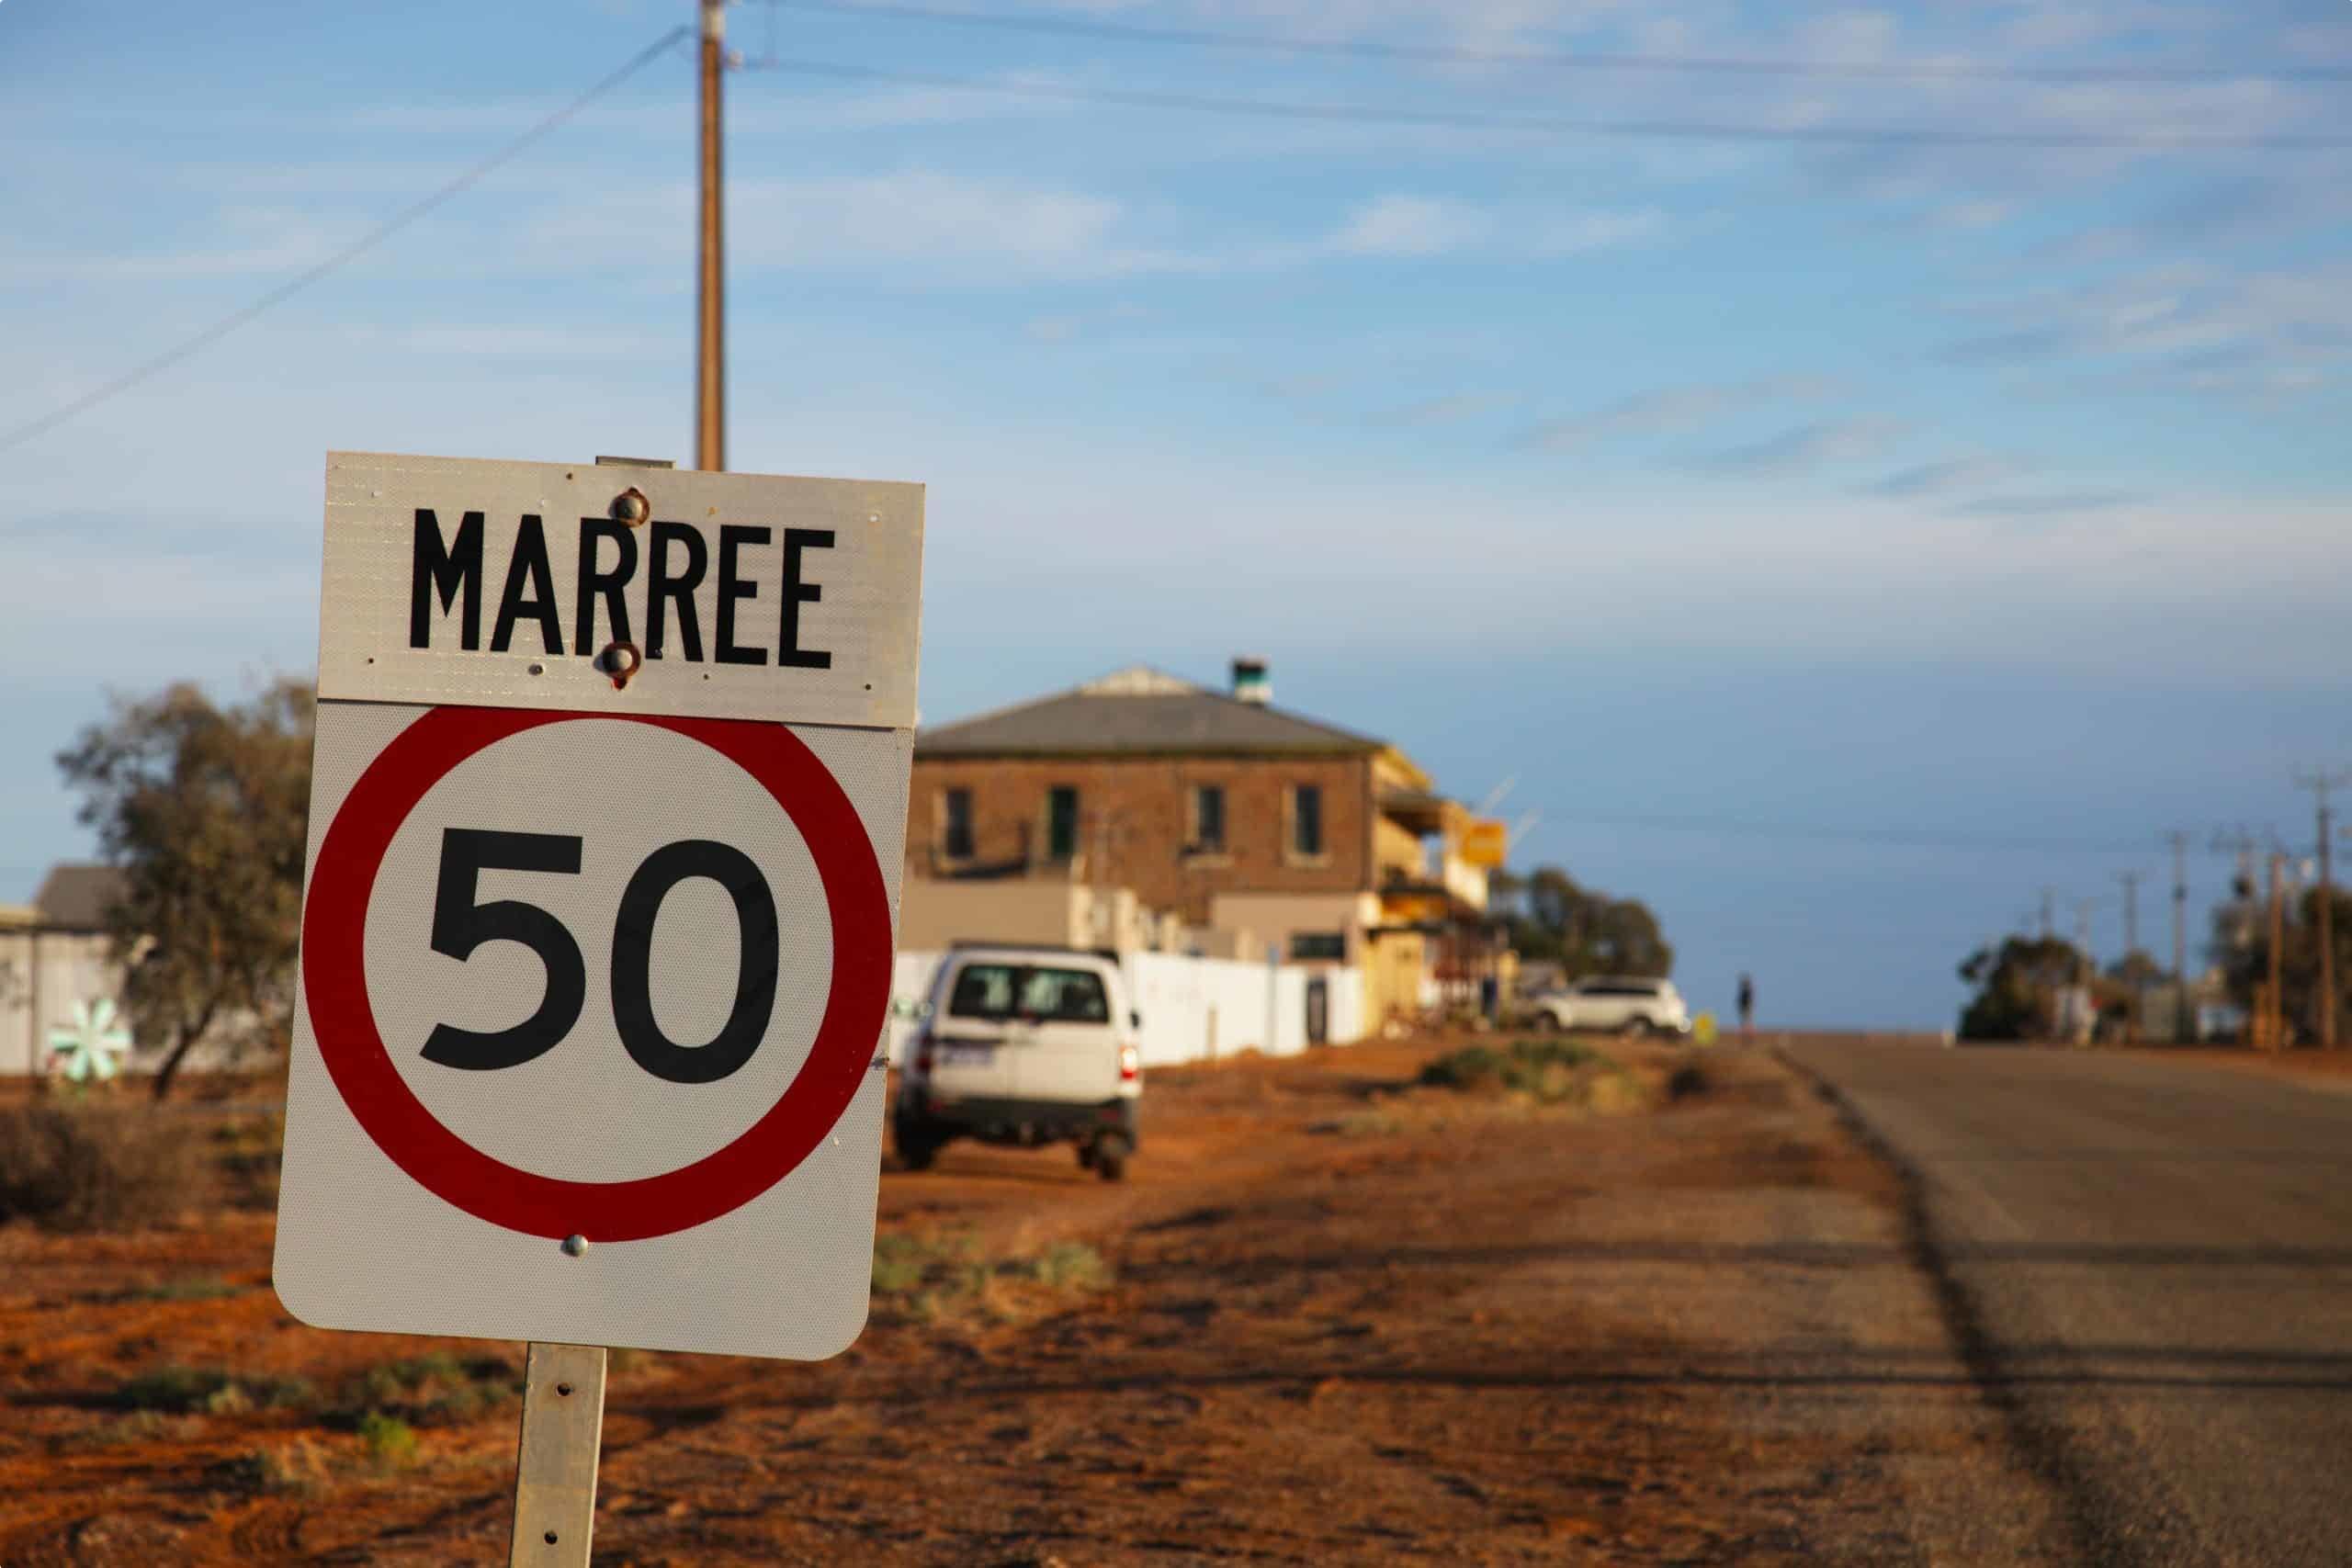 Marree